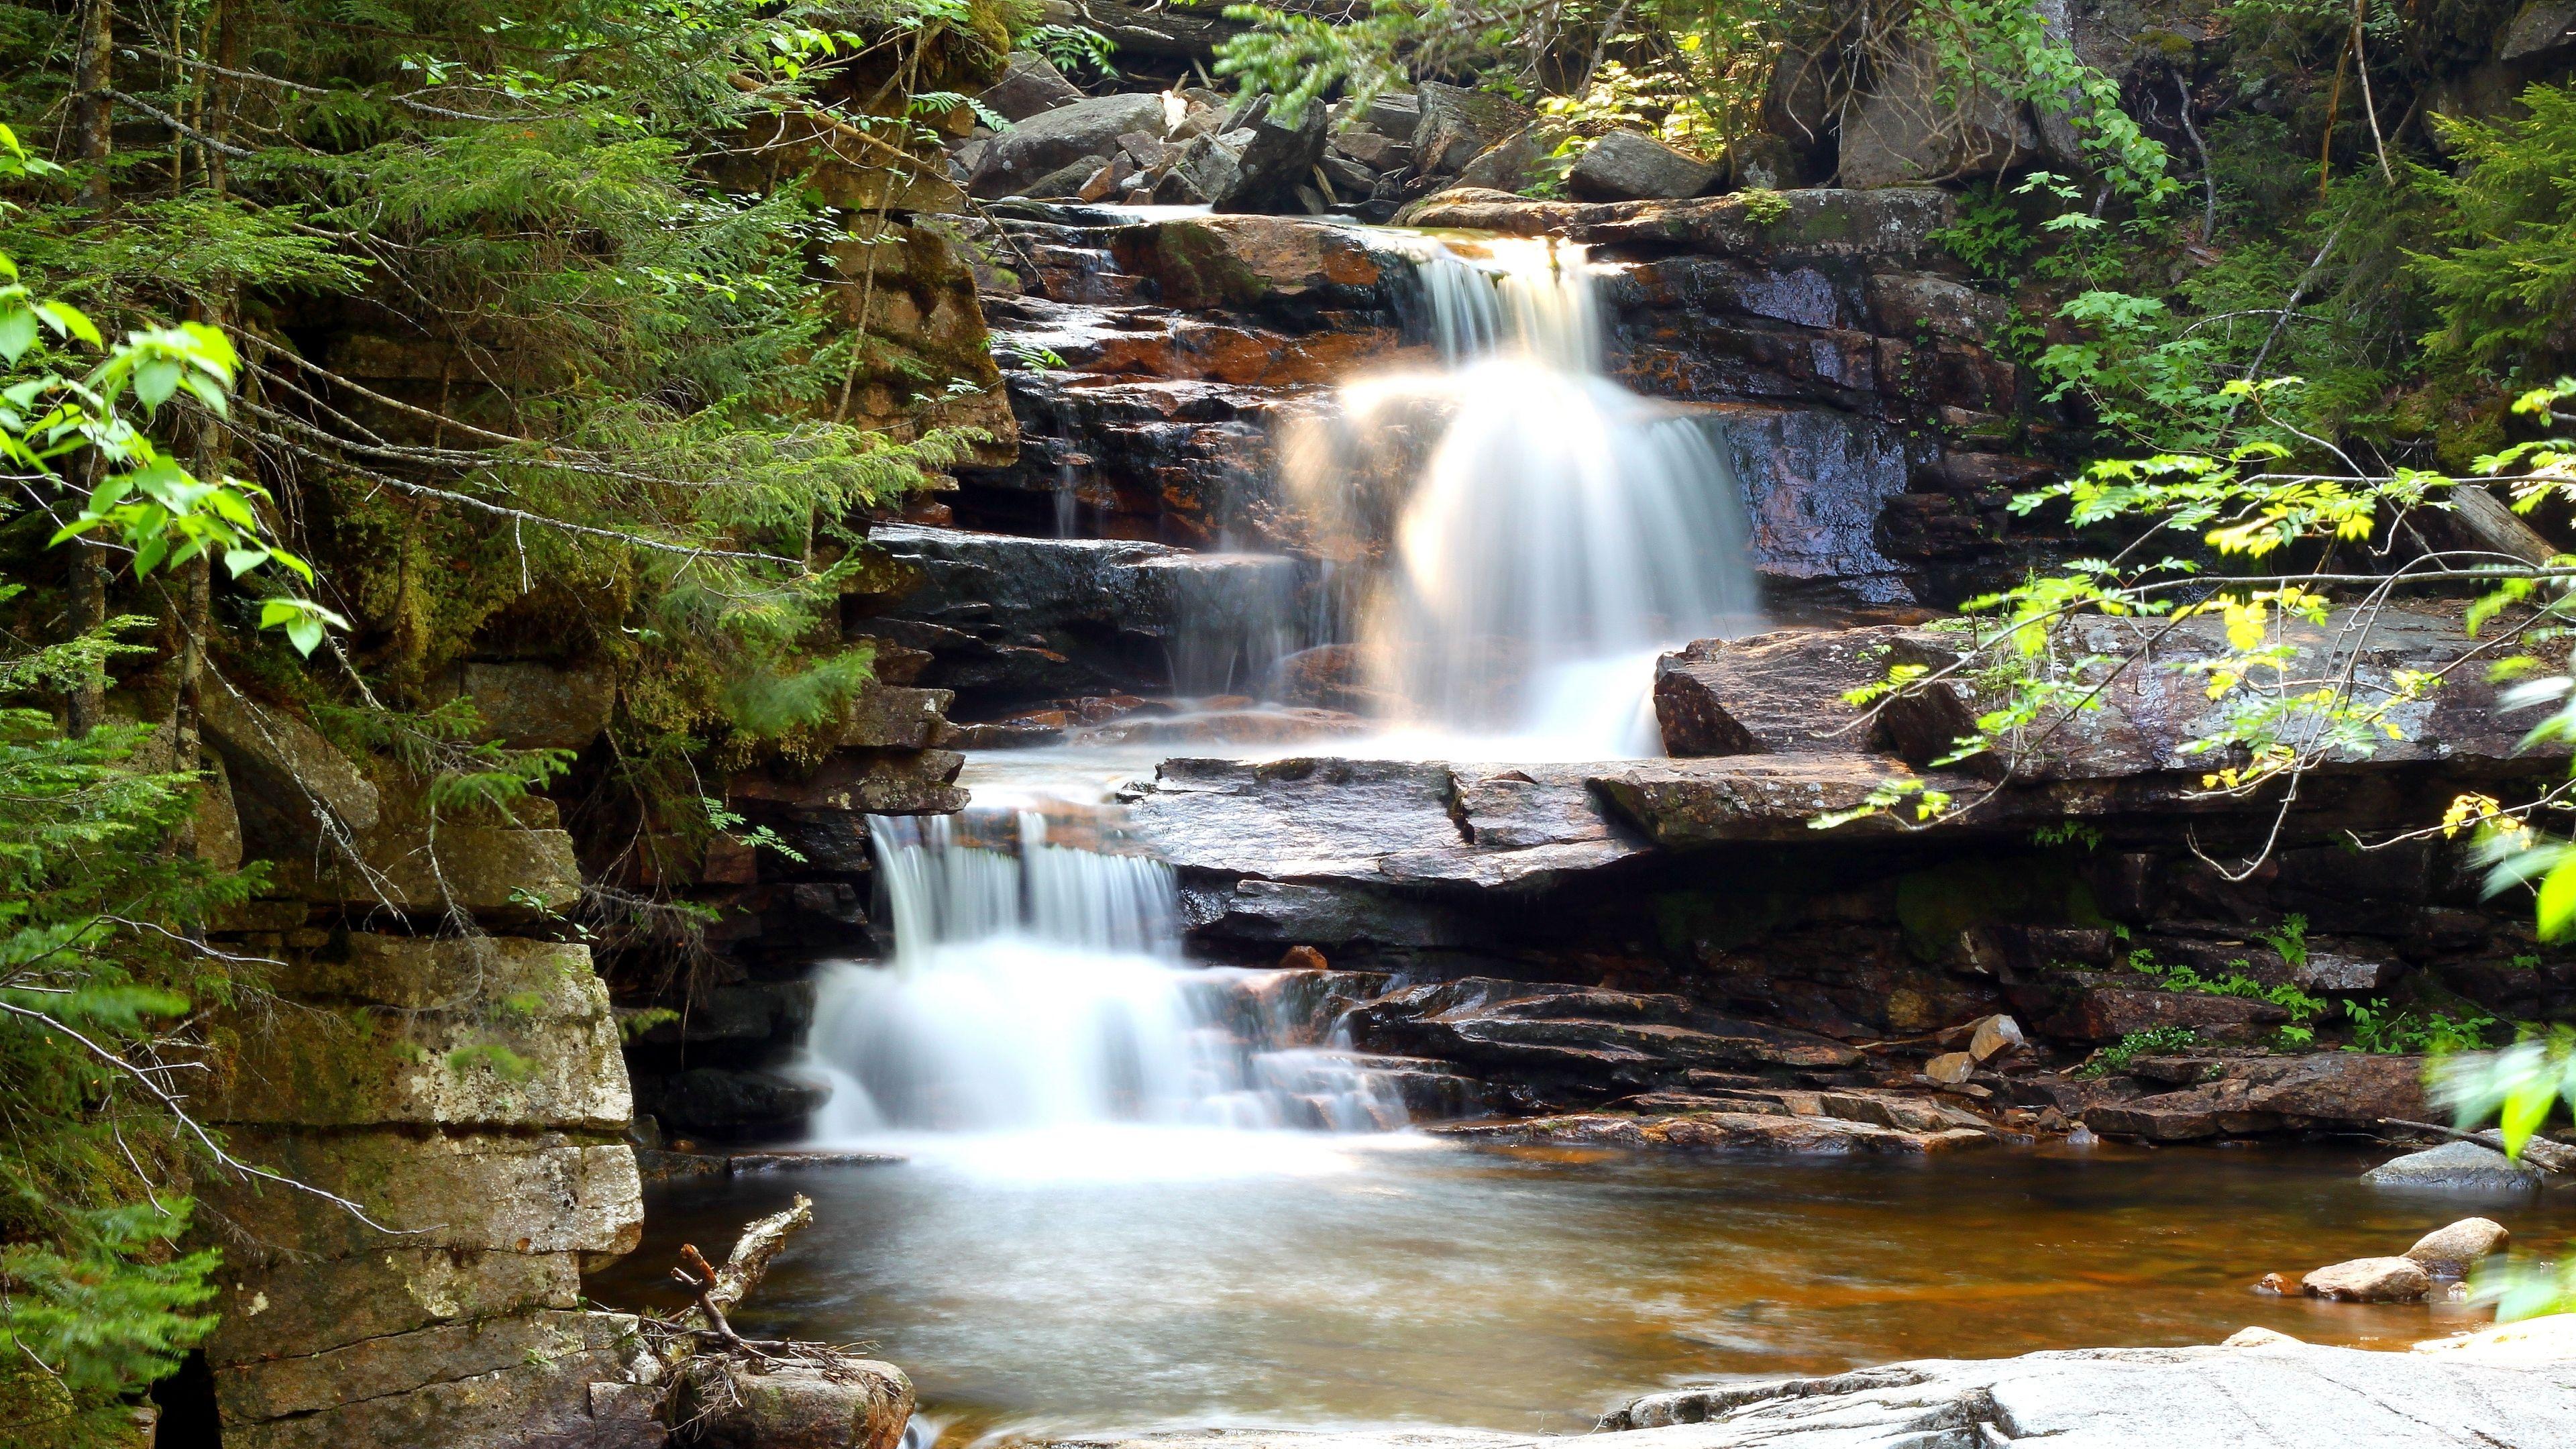 3840x2160 Wallpaper waterfall, cascade, rocks, nature (con